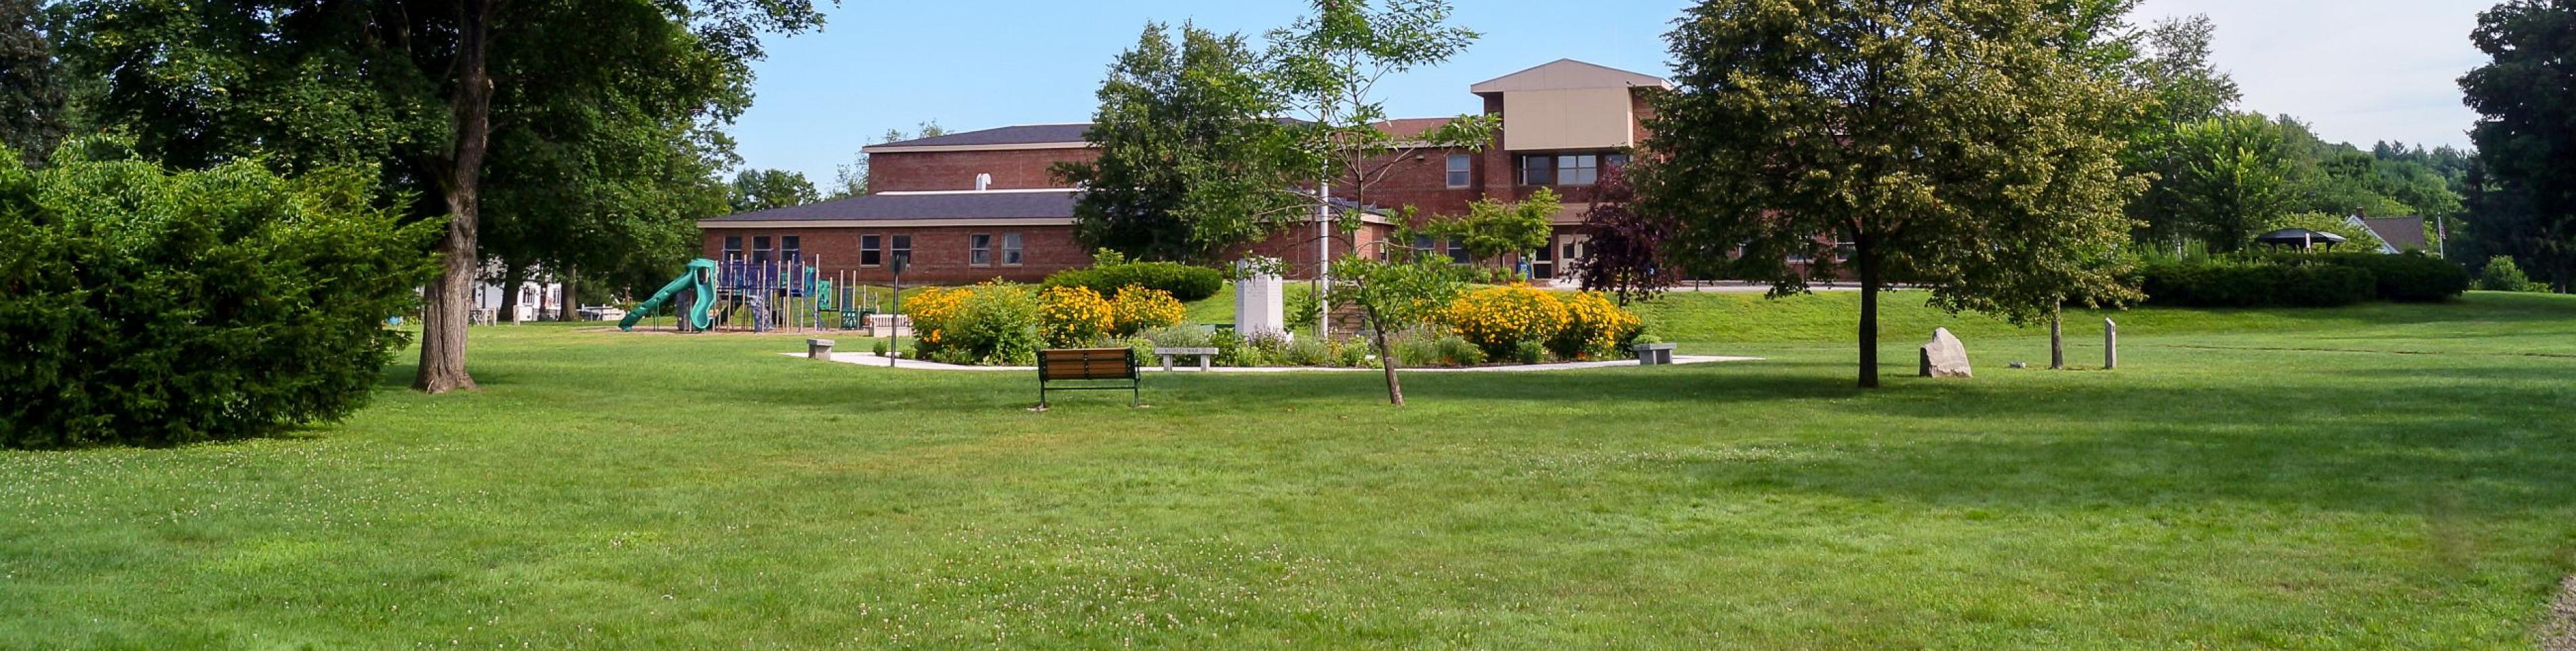 parks u0026 recreation city of keene